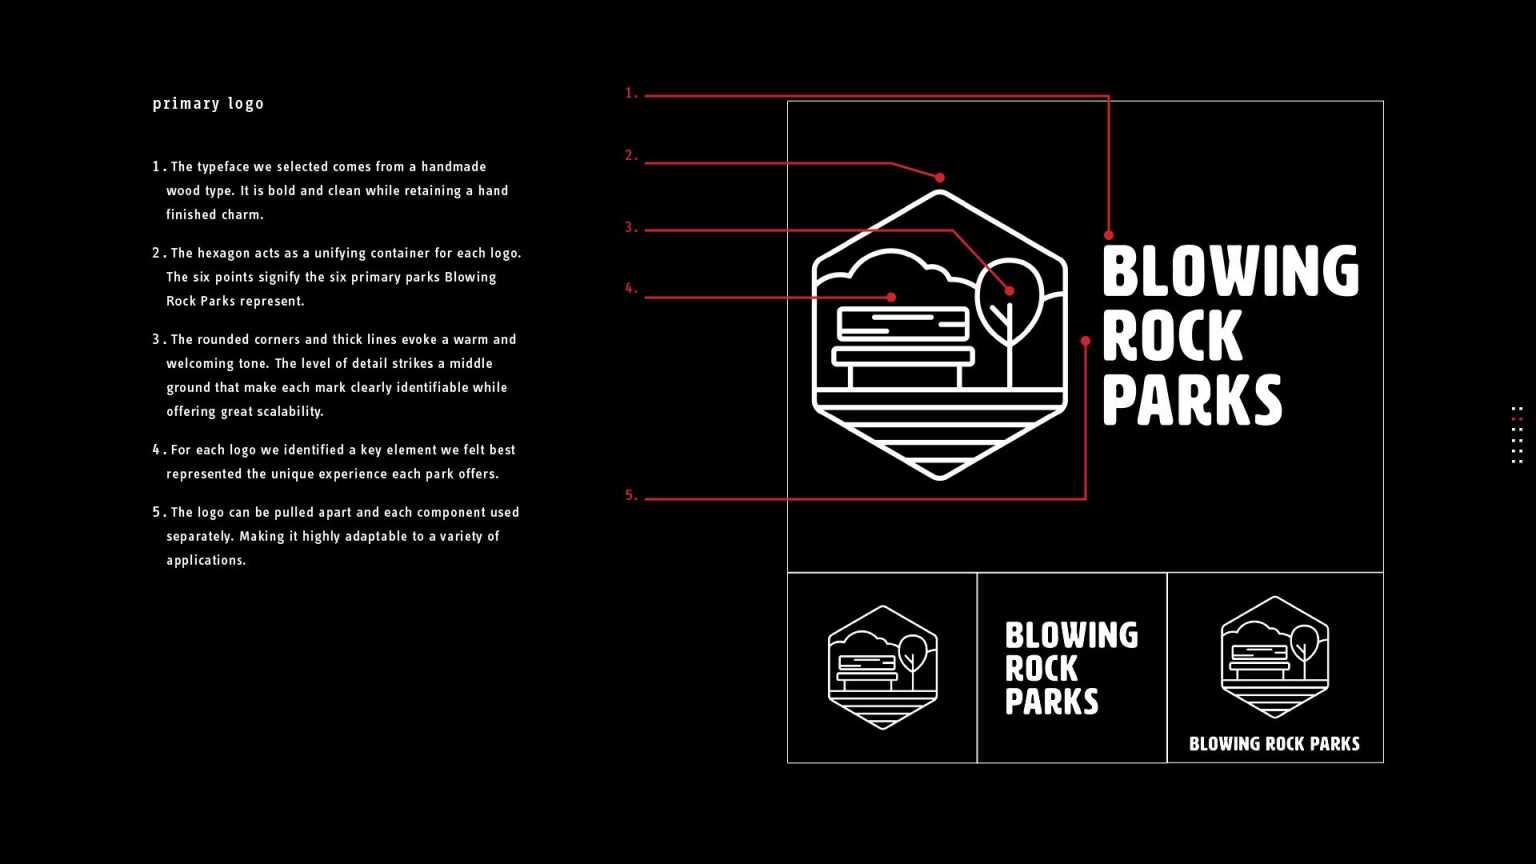 Blowing Rock Parks identity proposal